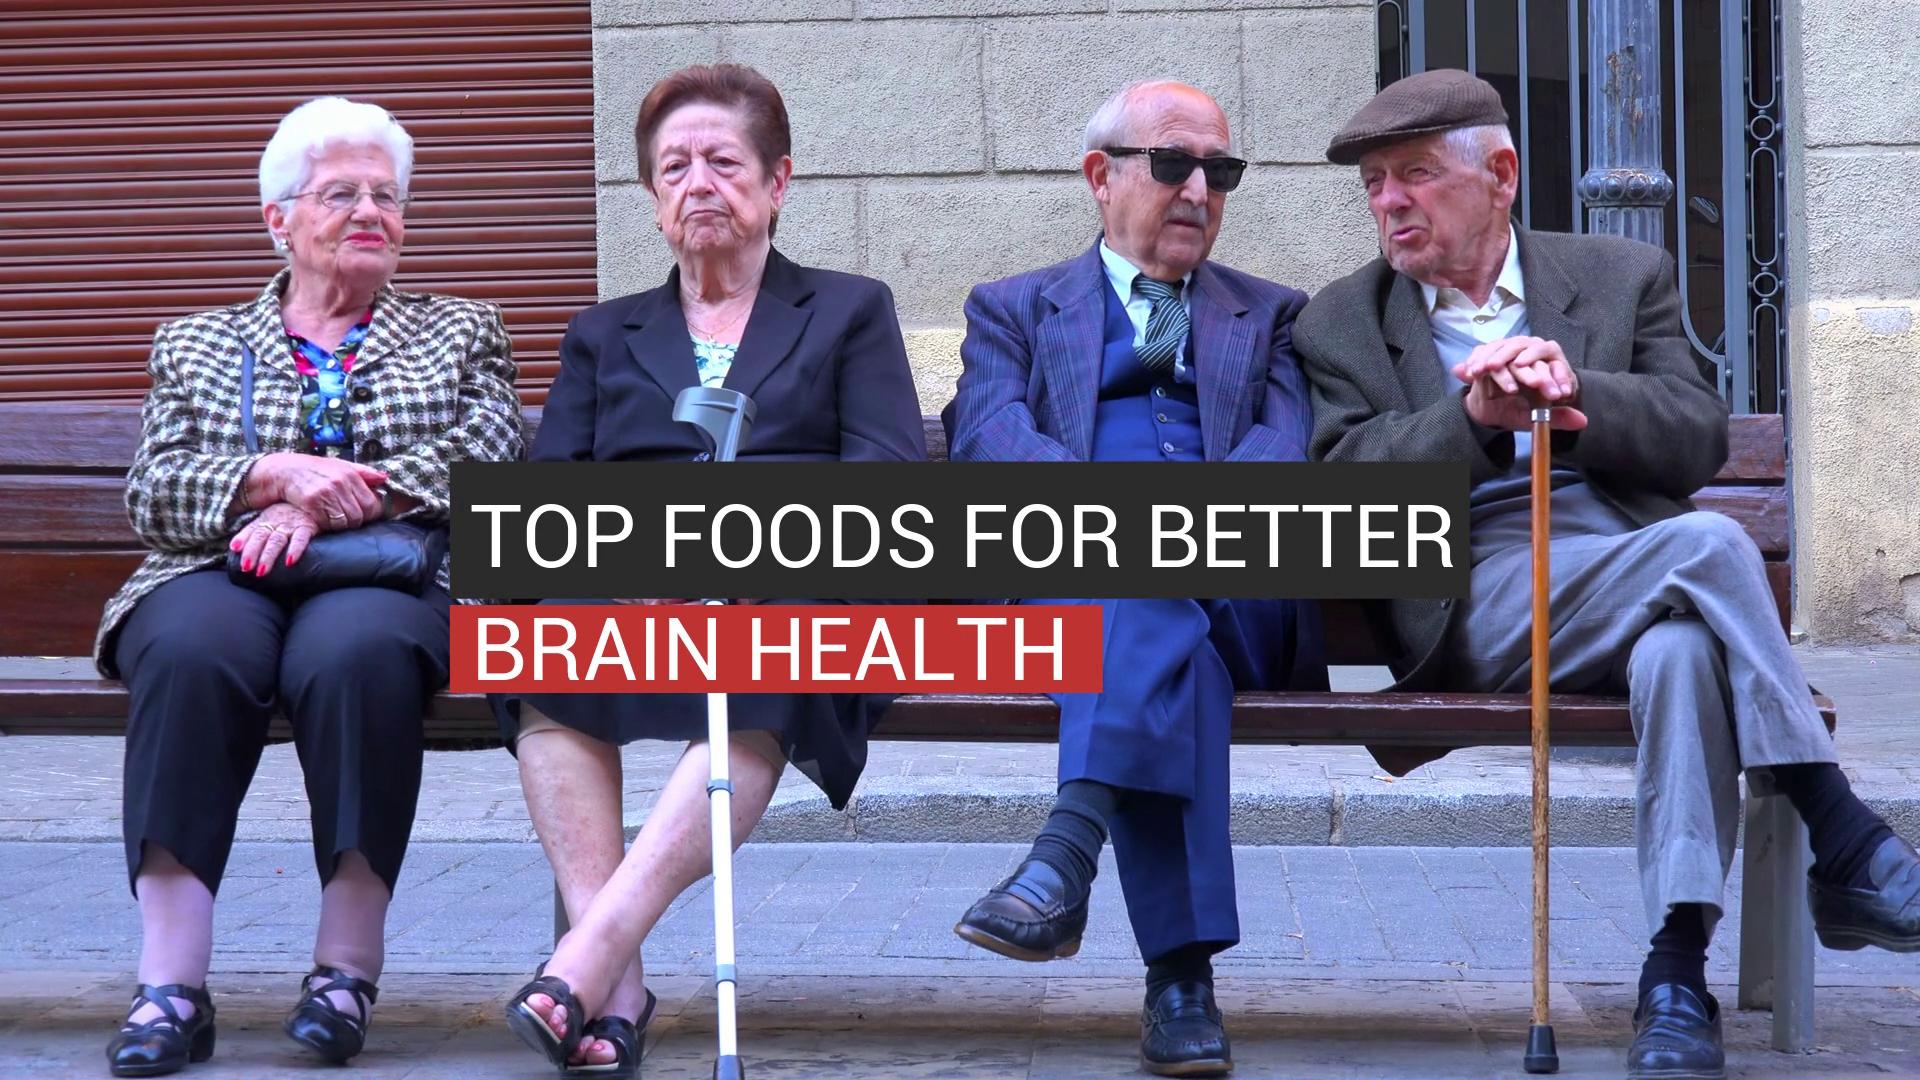 Top Foods For Better Brain Health